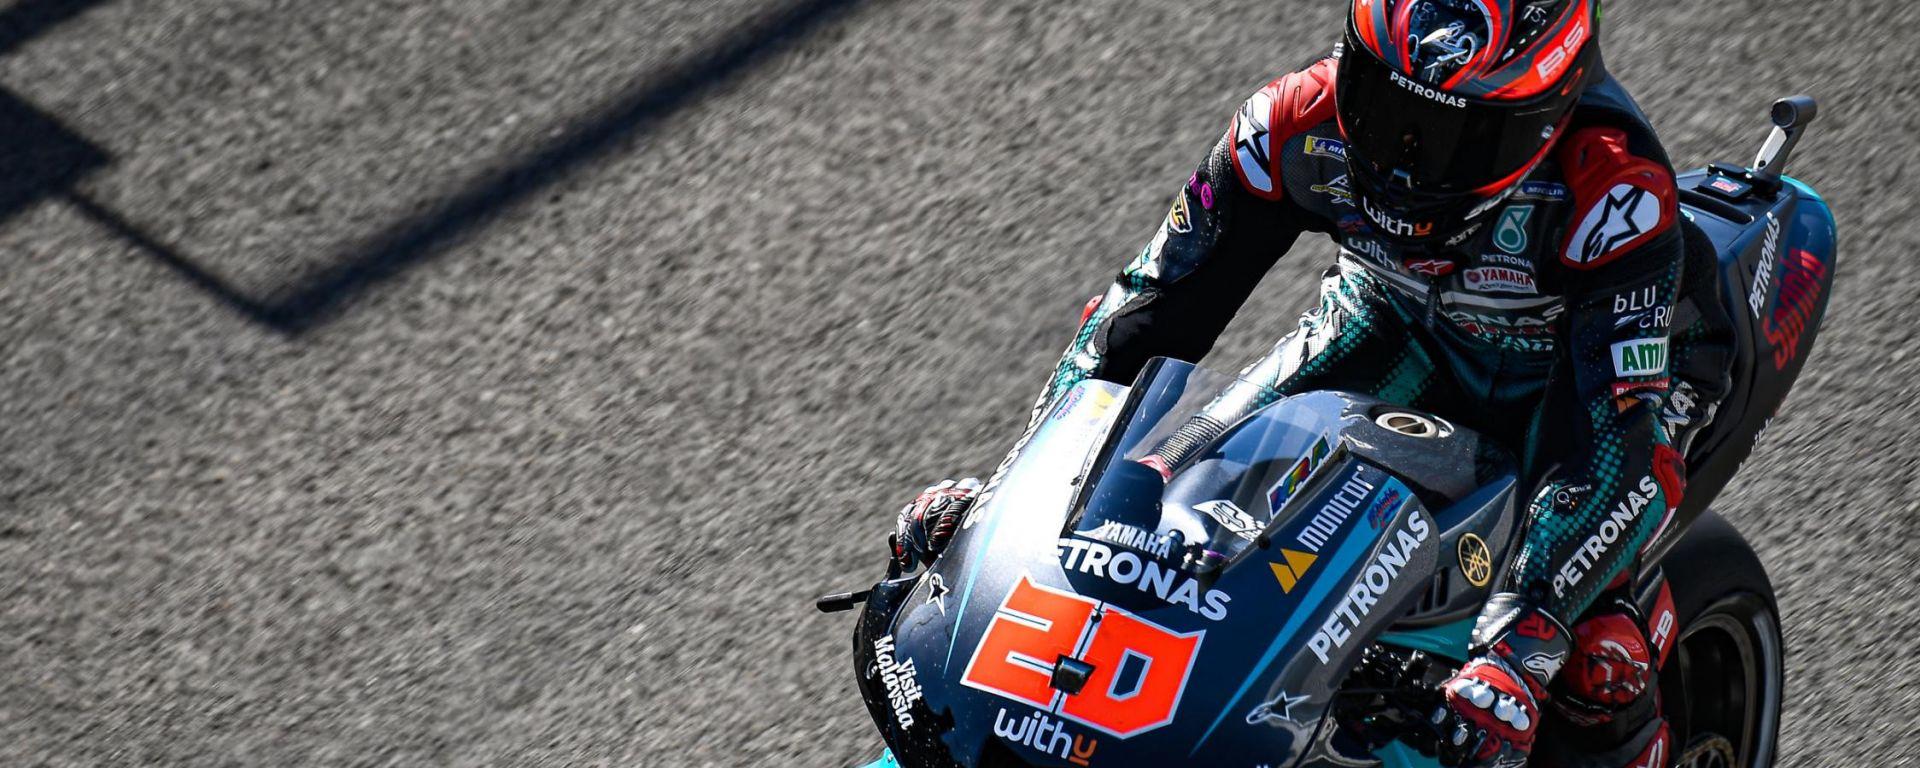 MotoGP Andalusia 2020, Jerez - Fabio Quartararo (Yamaha)